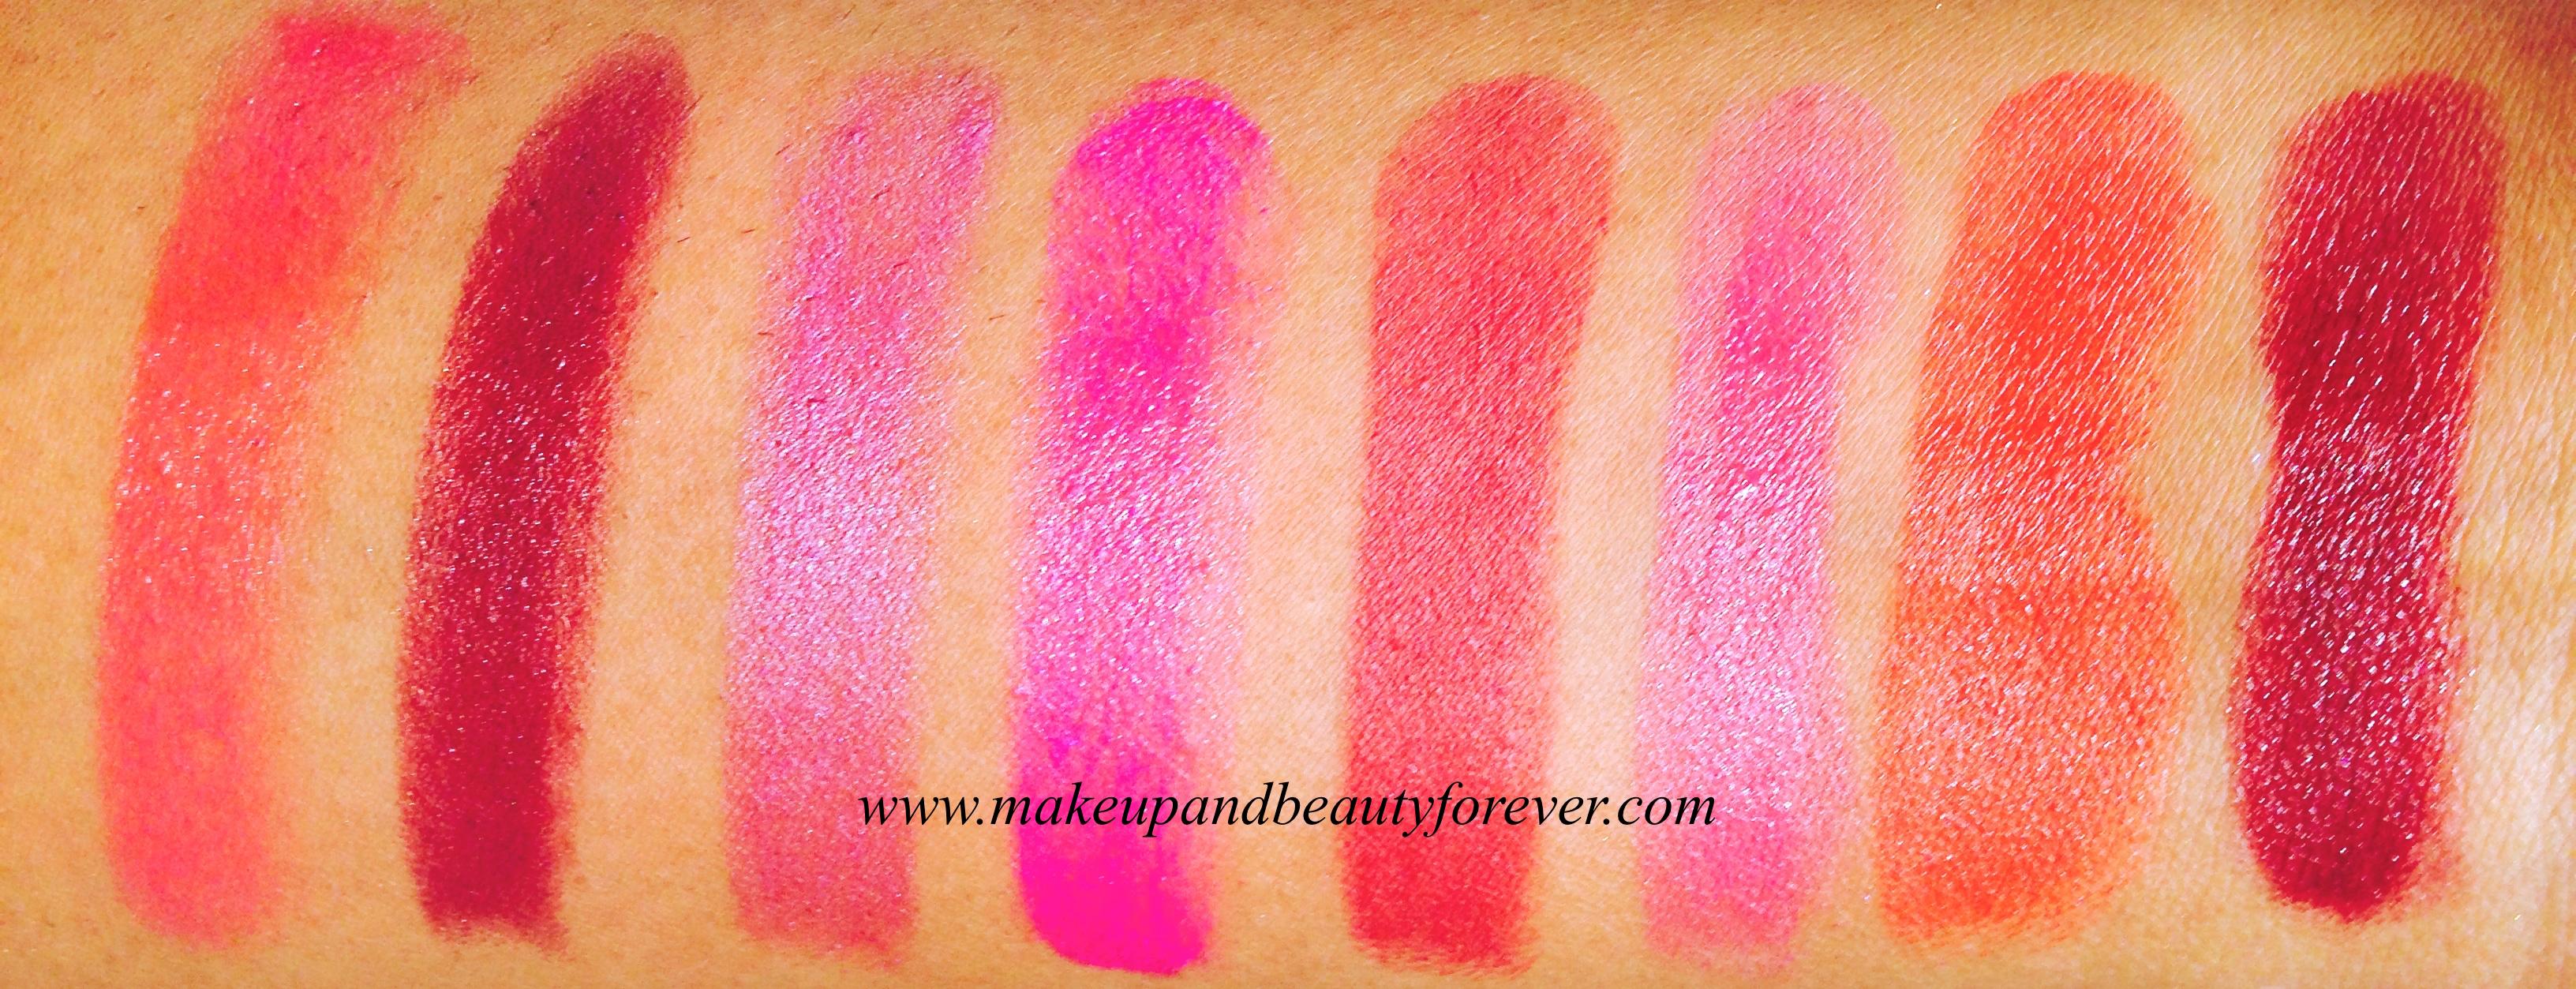 Revlon Super Lustrous Lipstick Caramel Glace Rosedew